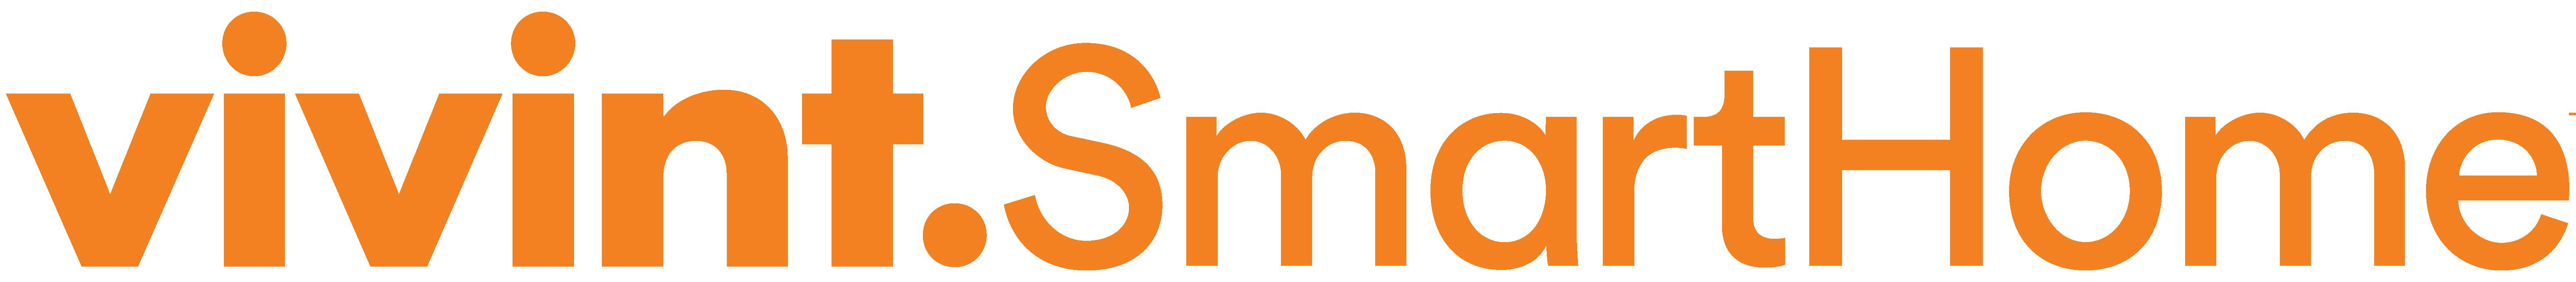 Company Logo Vivint